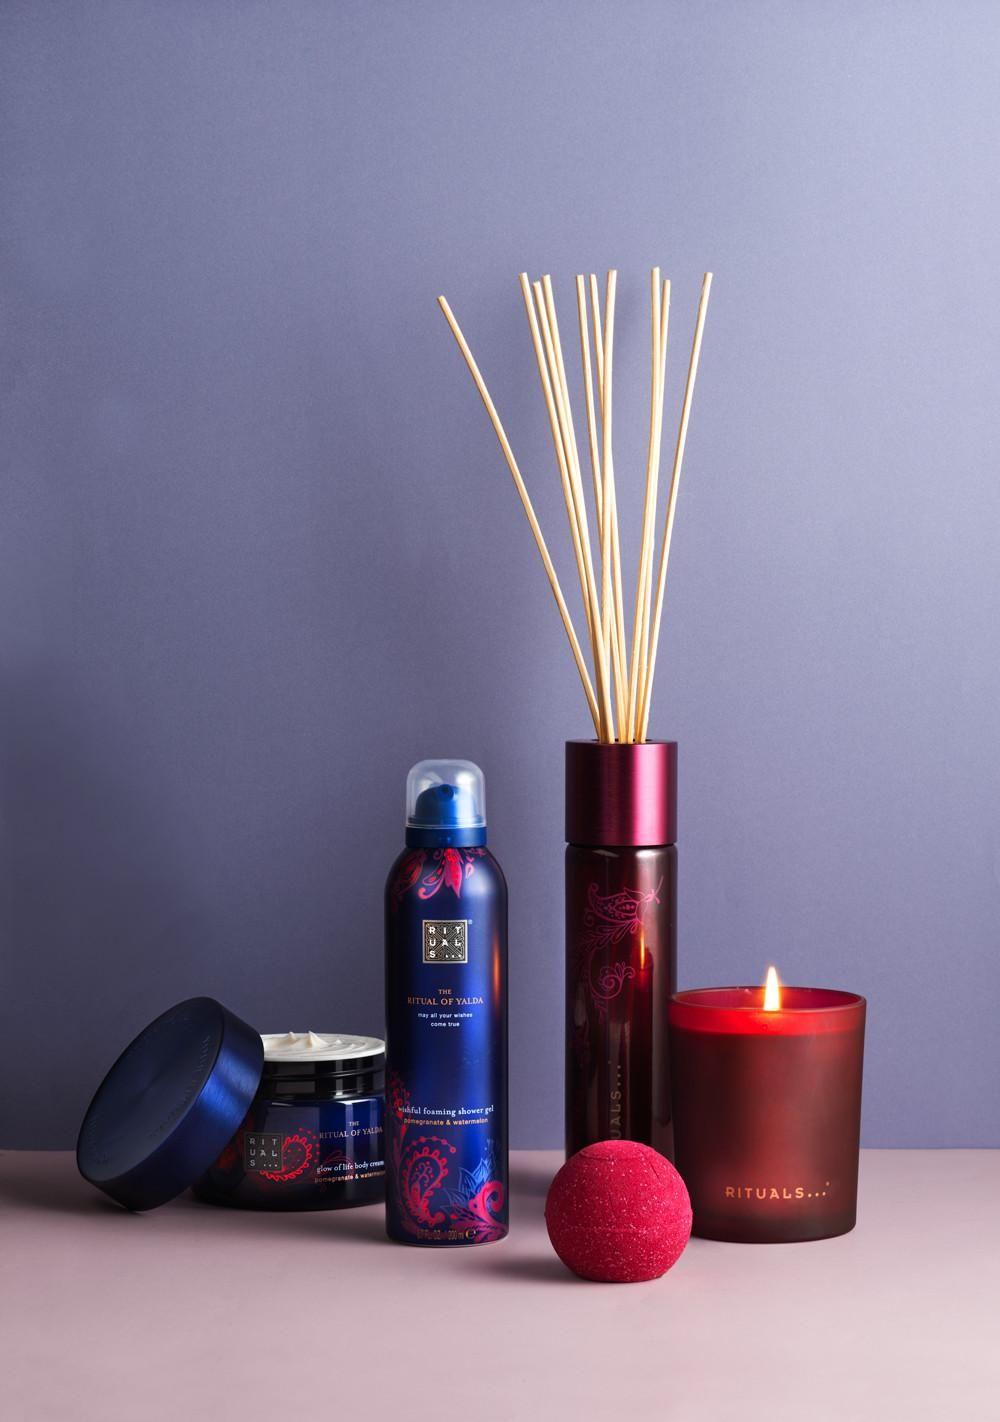 11x JAN Magazine + Rituals Yalda Limited Edition set t.w.v. €85,50 voor €59,95